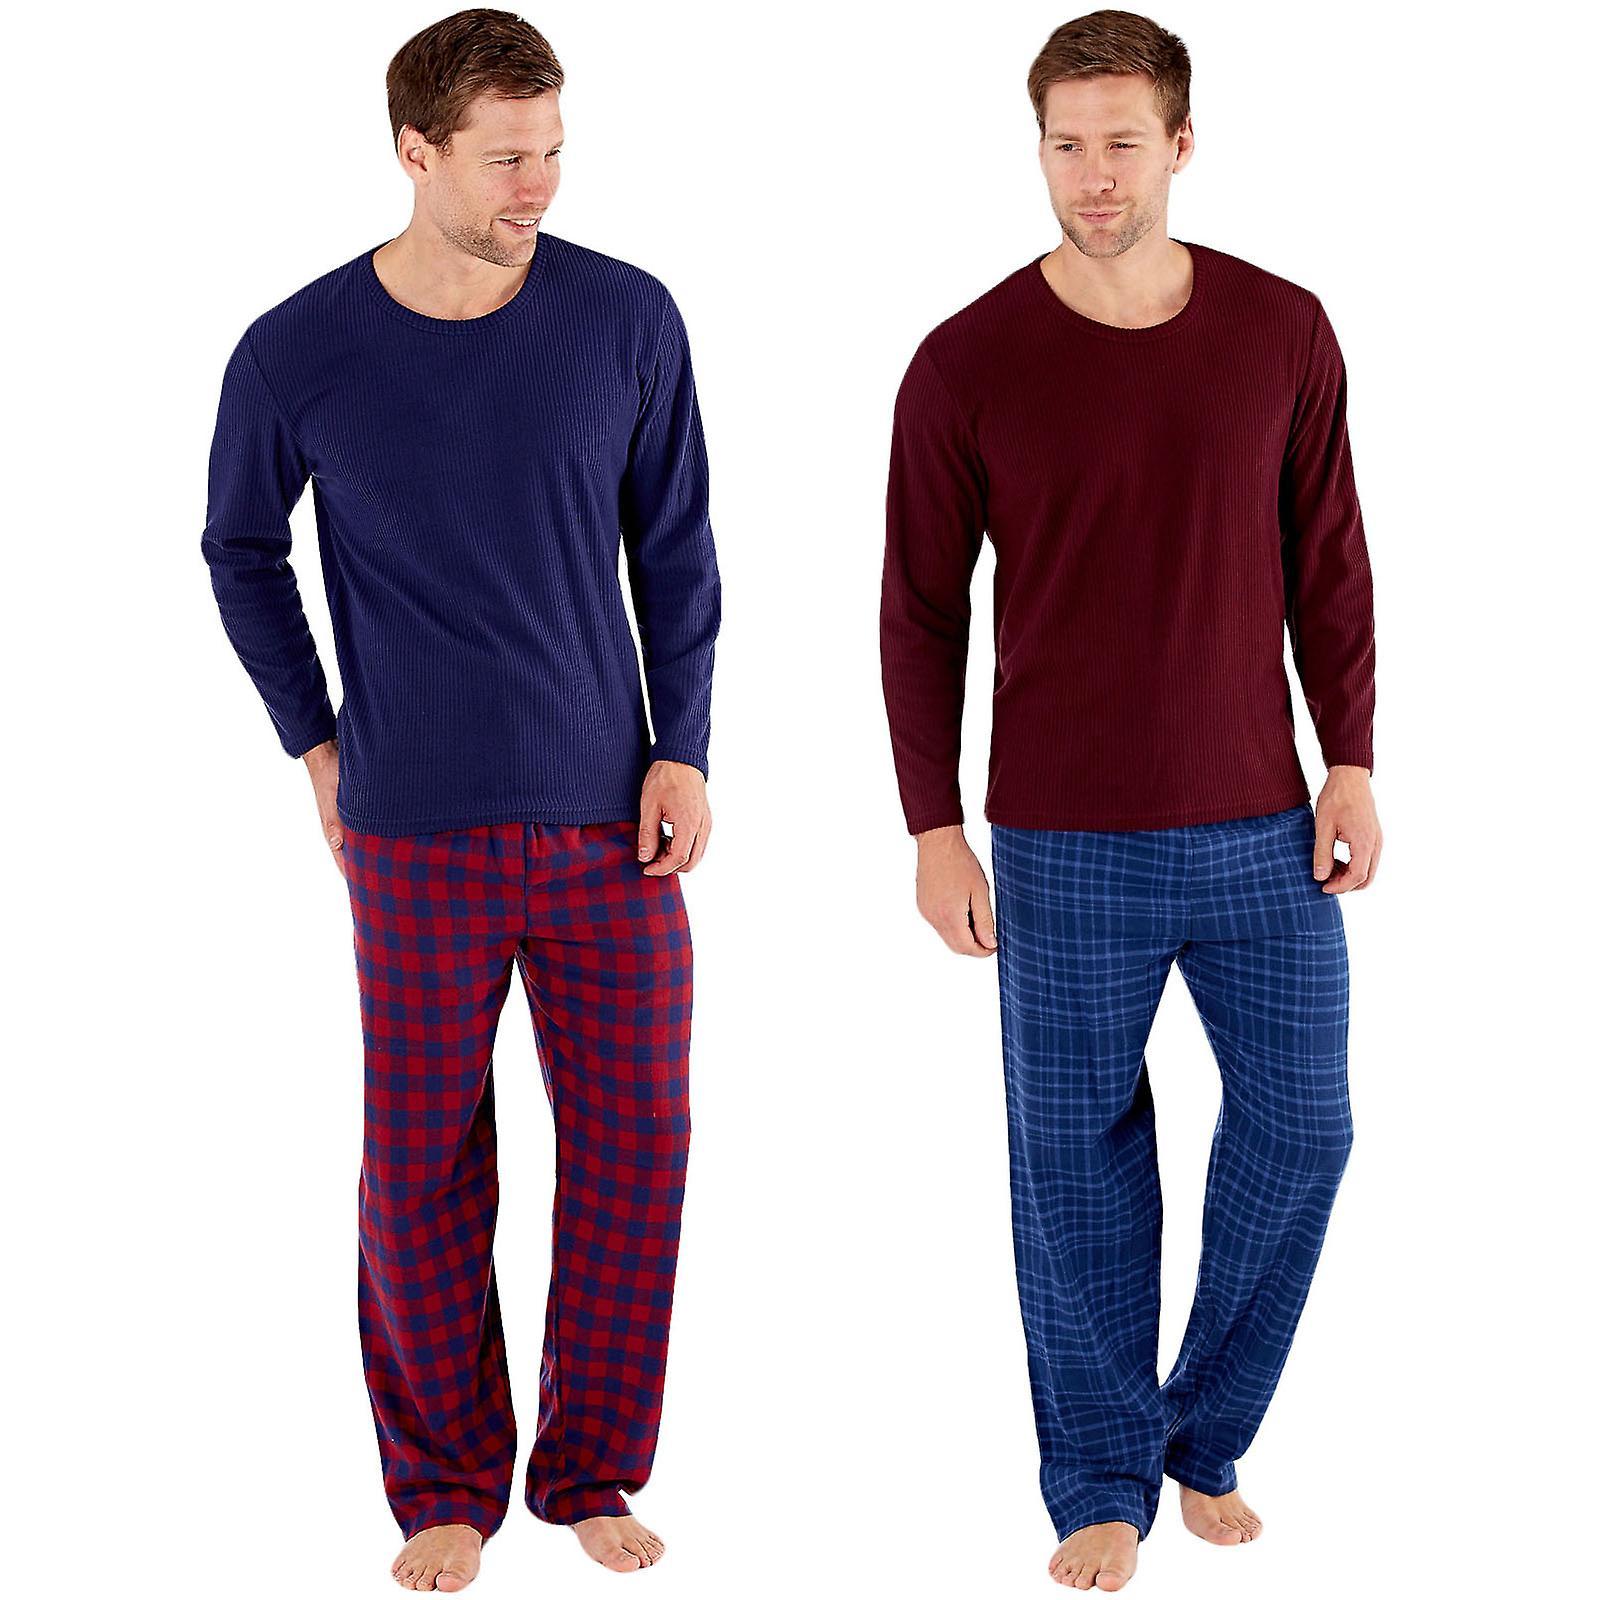 Kauf authentisch großer Rabattverkauf Rabatt bis zu 60% Harvey James Mens Warm Winter Thermal Fleece Check Loungewear Pyjamas PJs  Set